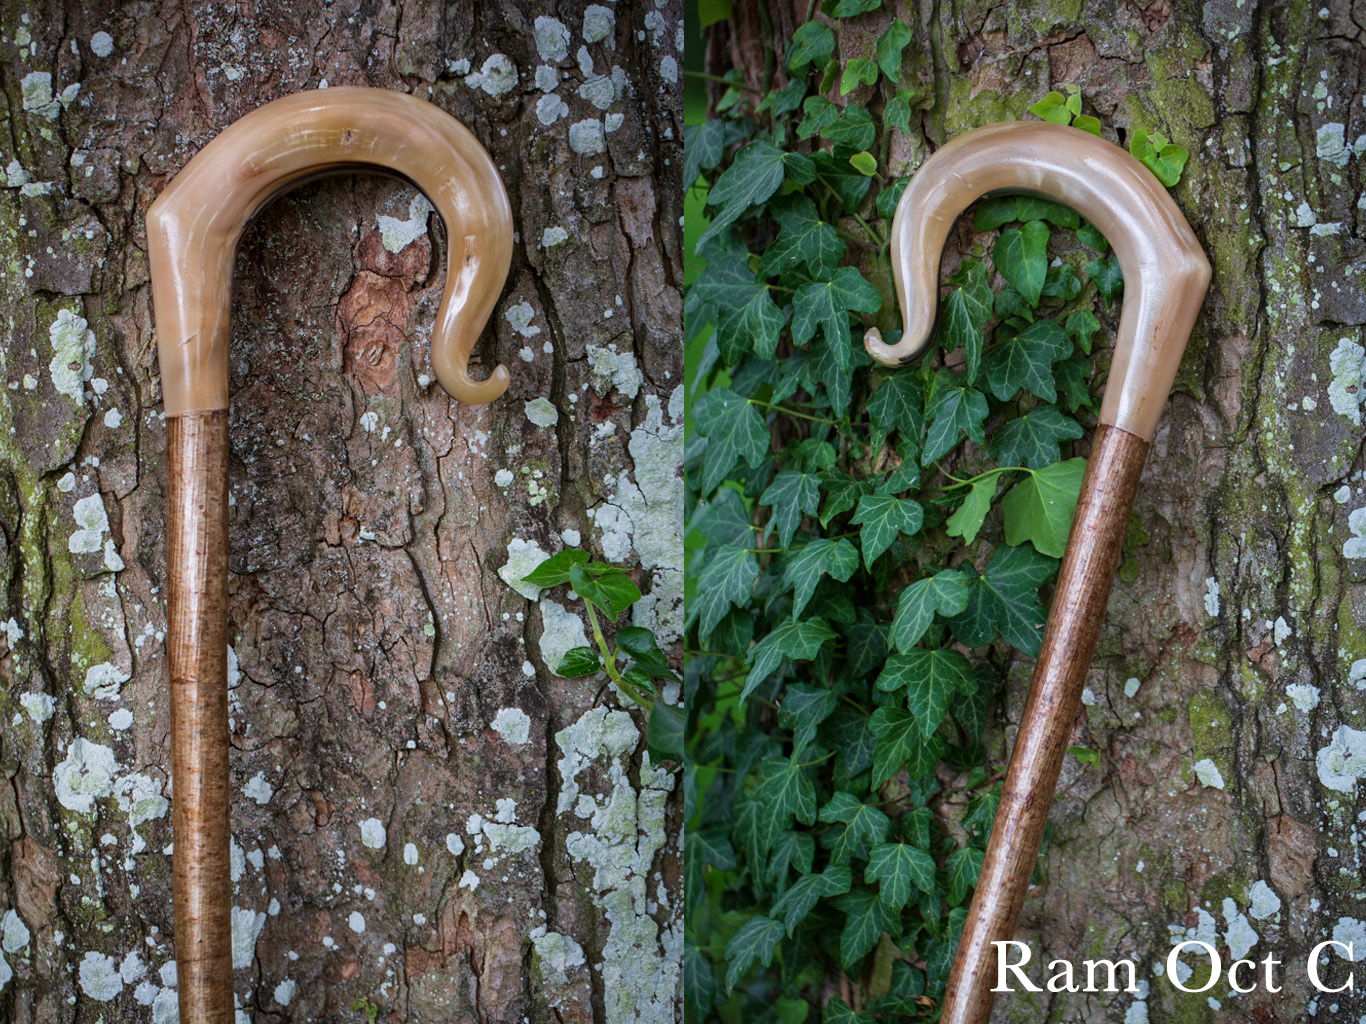 Ram Oct C